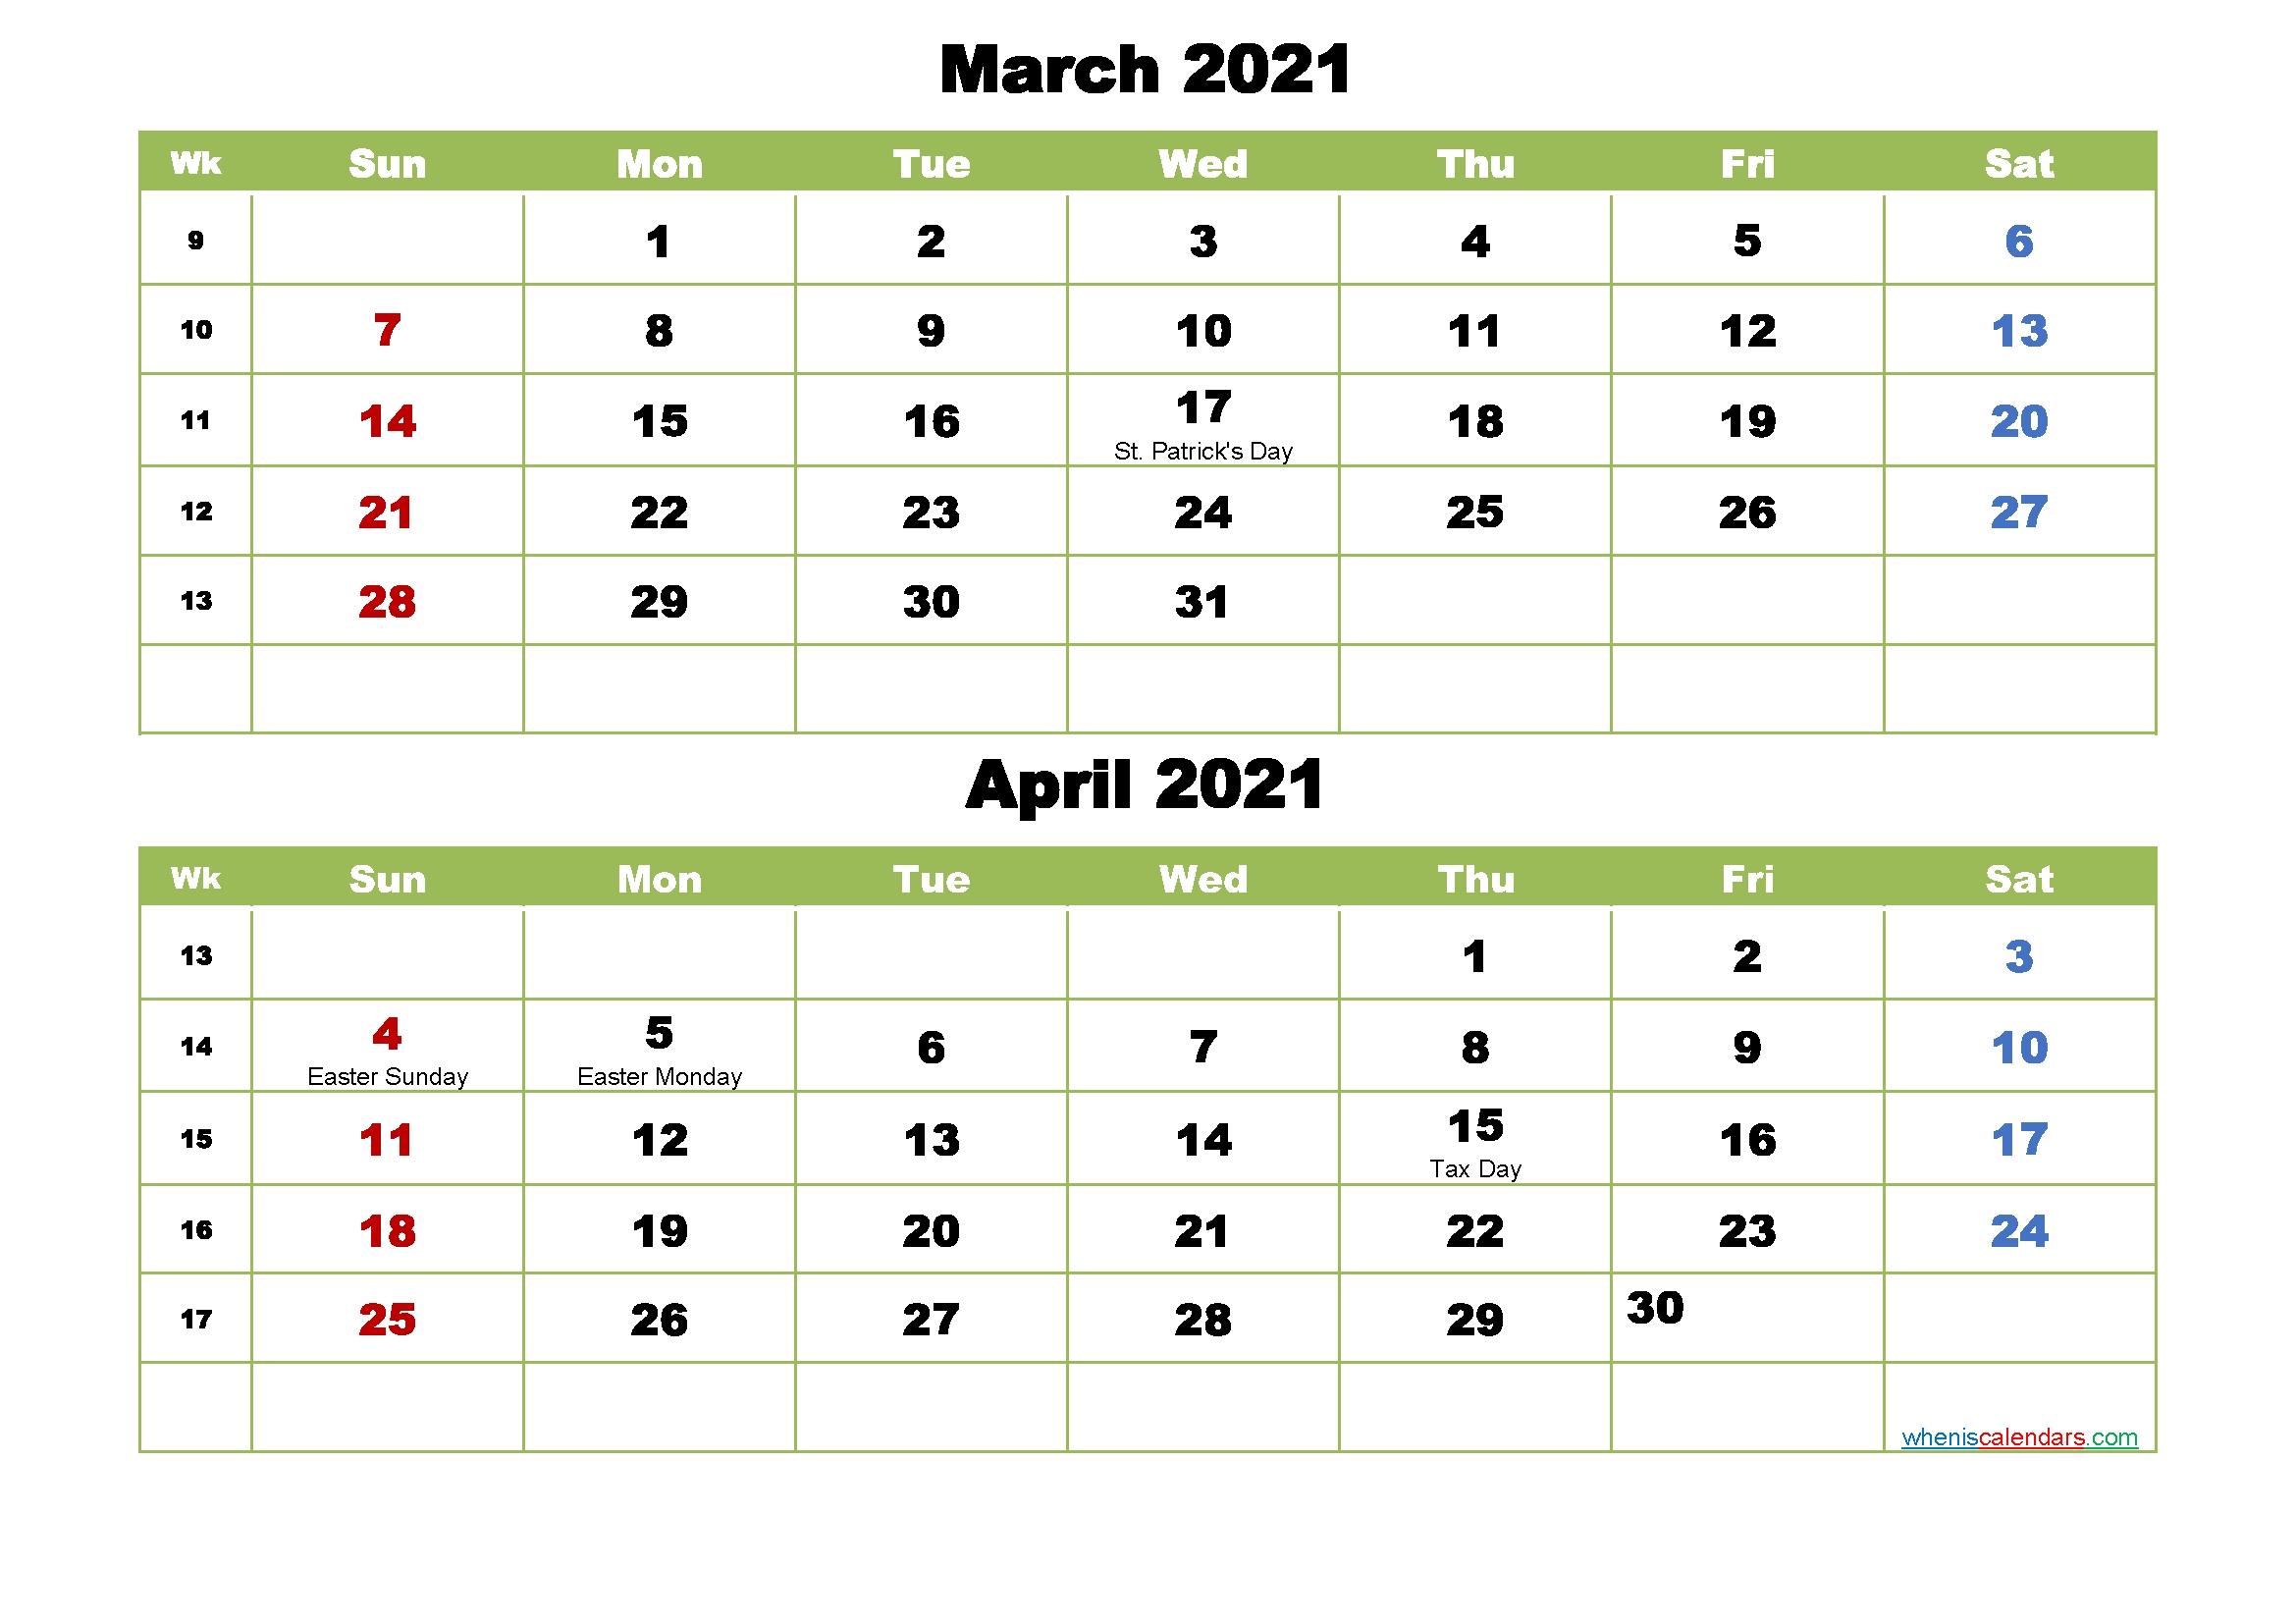 Get March April 2021